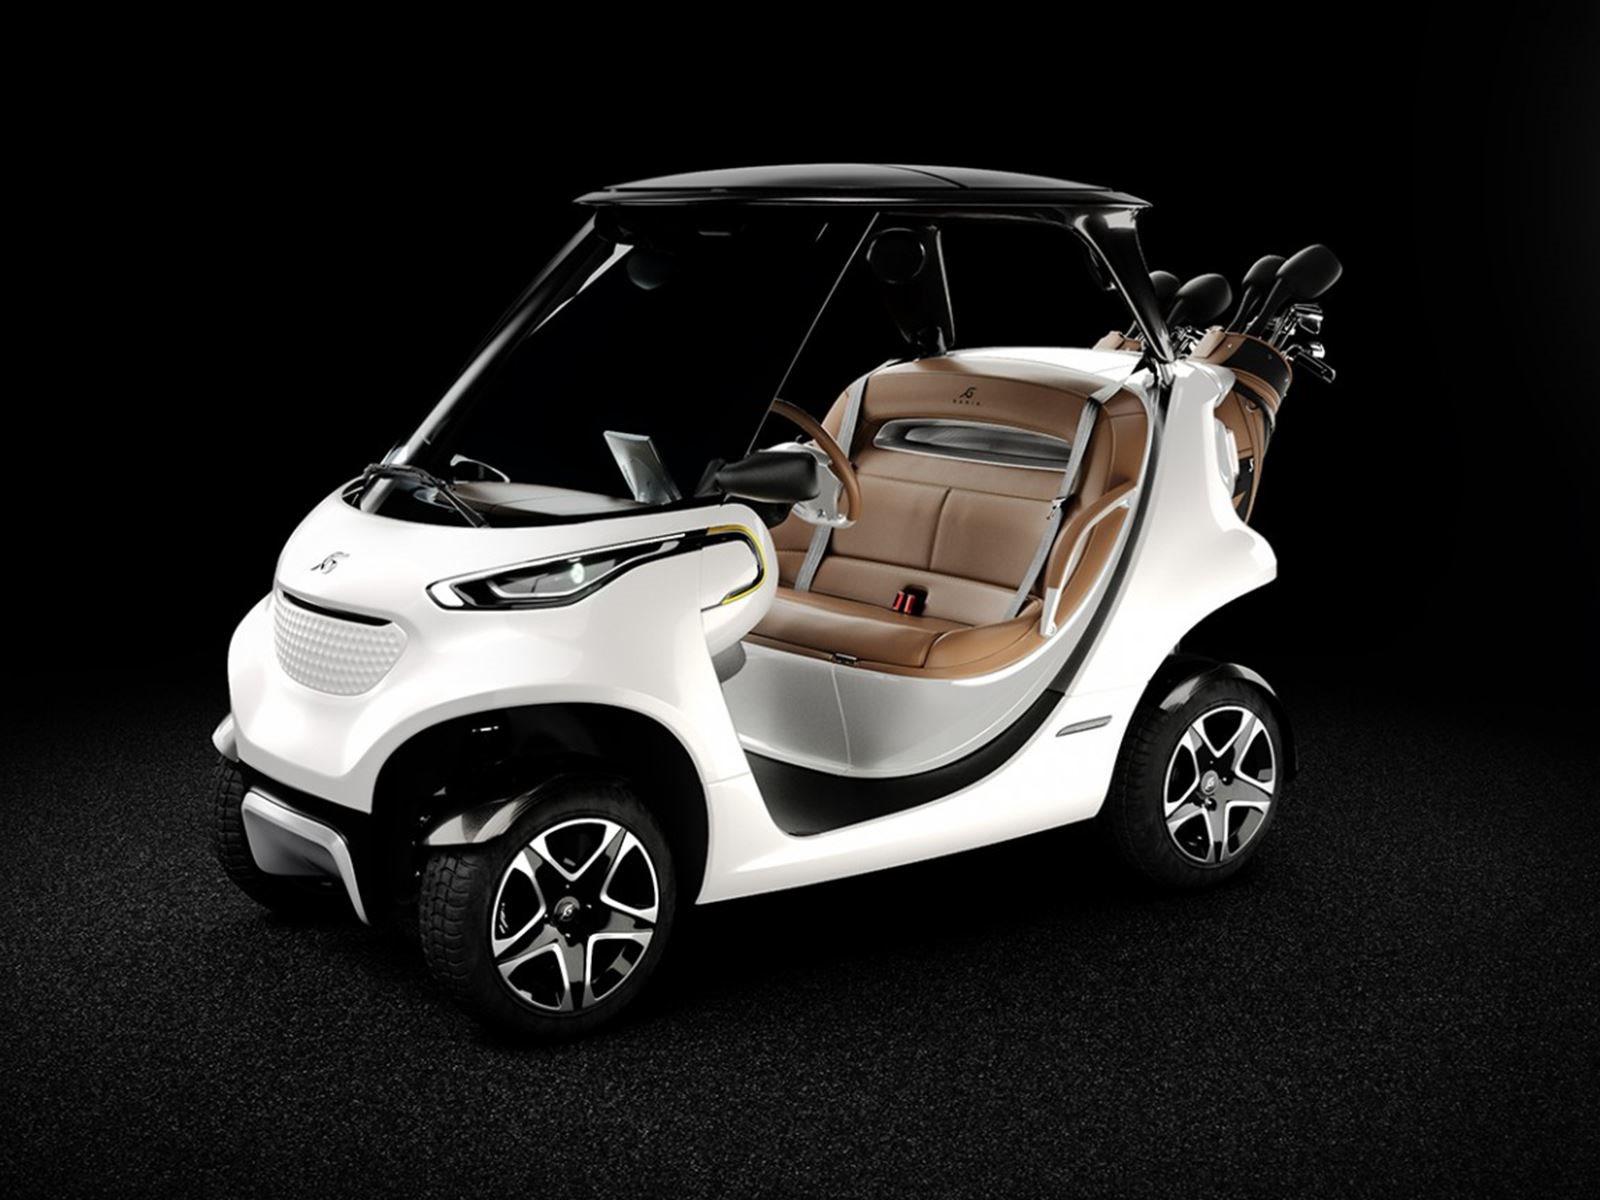 Luxury Golf Cart Costs More Than A Mercedes Benz E Class Carbuzz